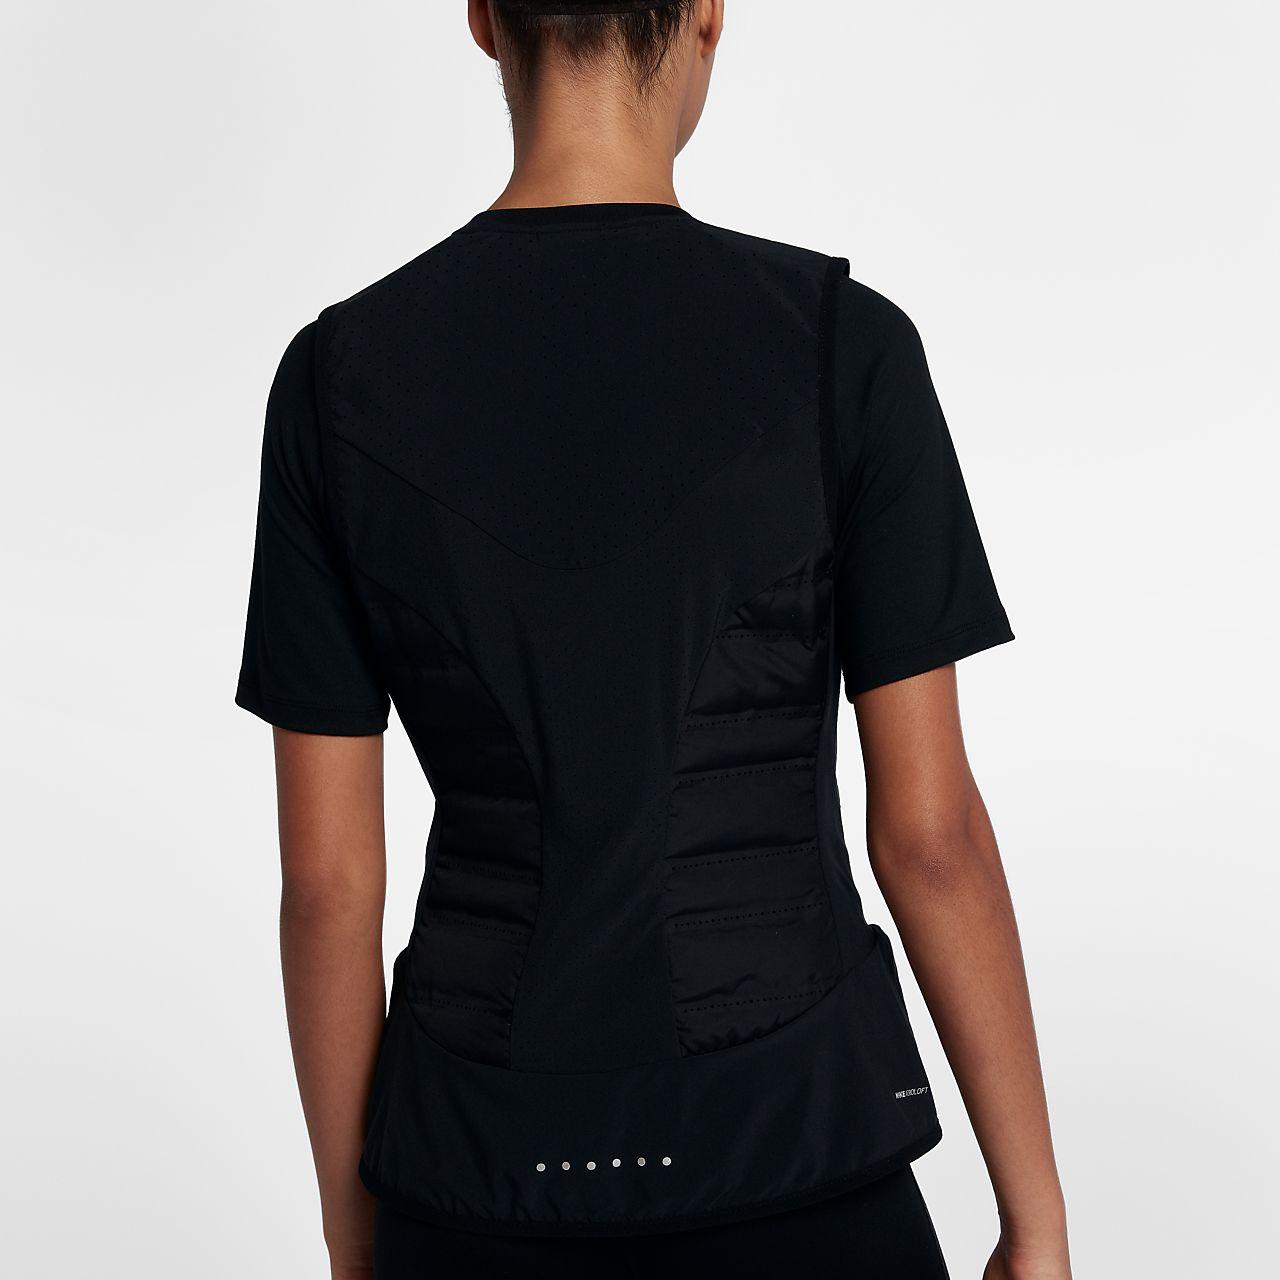 Nike Vapor Reflective Women S Running Jacket Ho14 Black